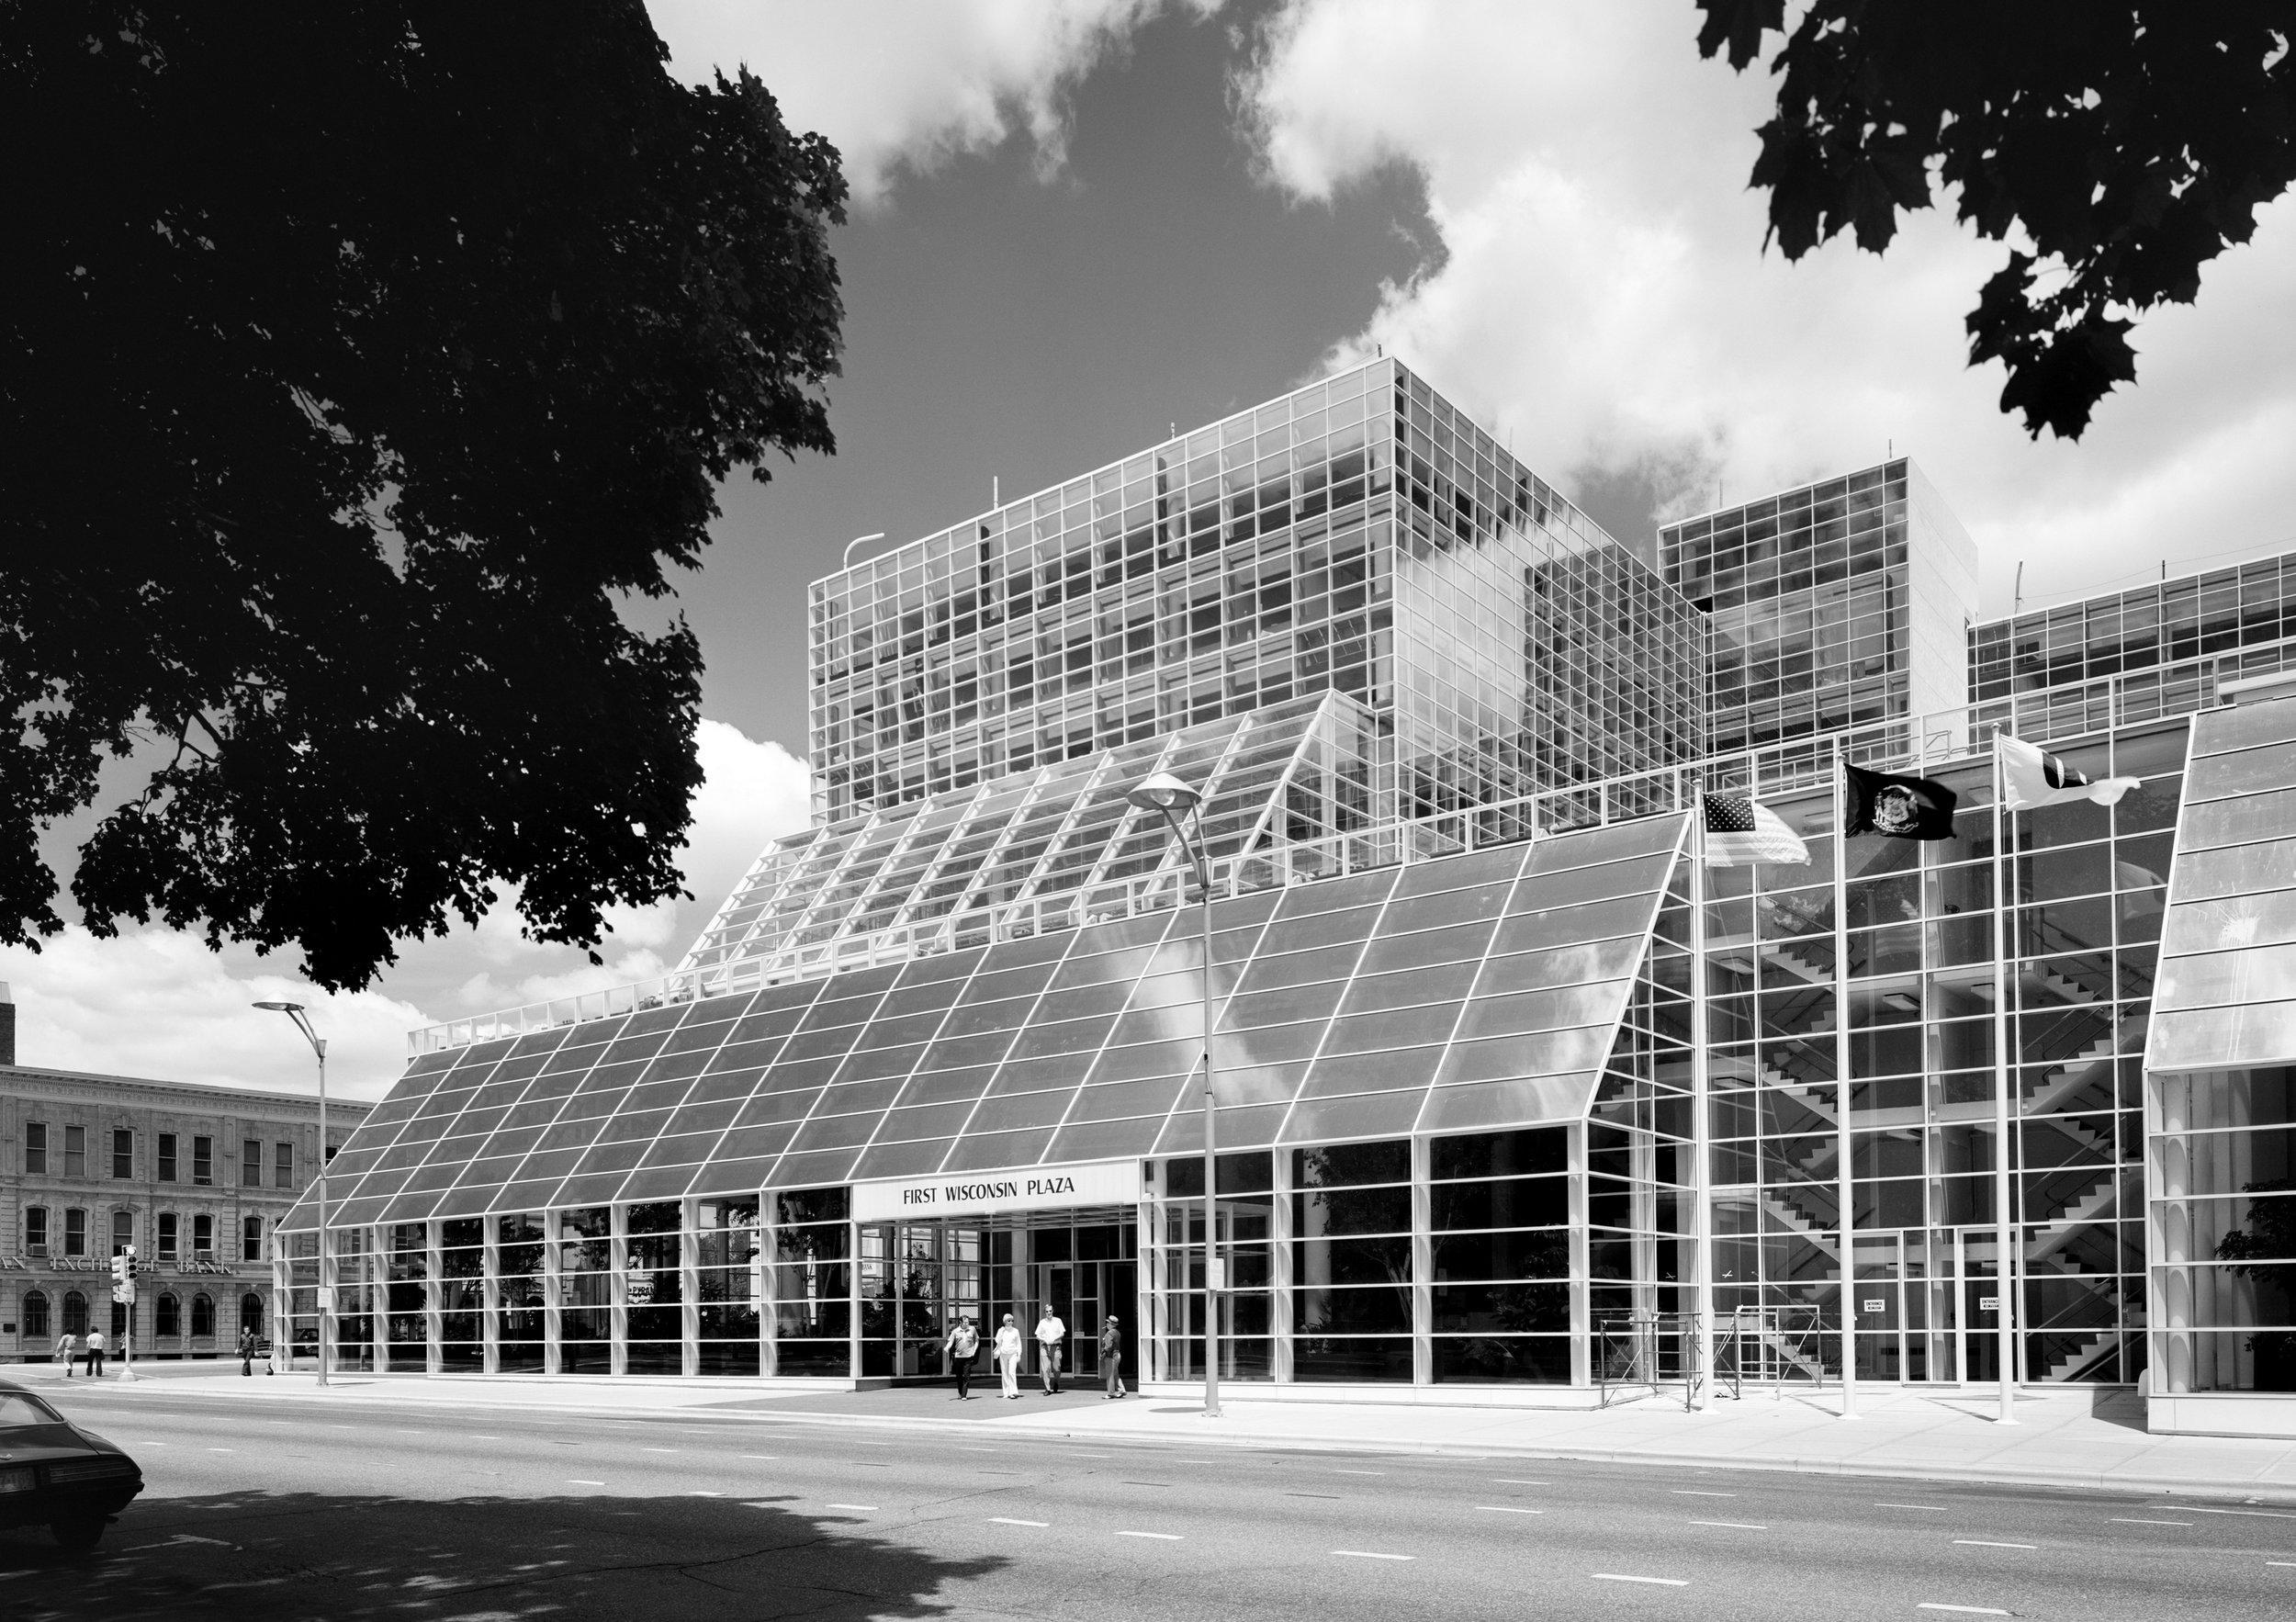 First Wisconsin Plaza as built per Bruce Graham's design.